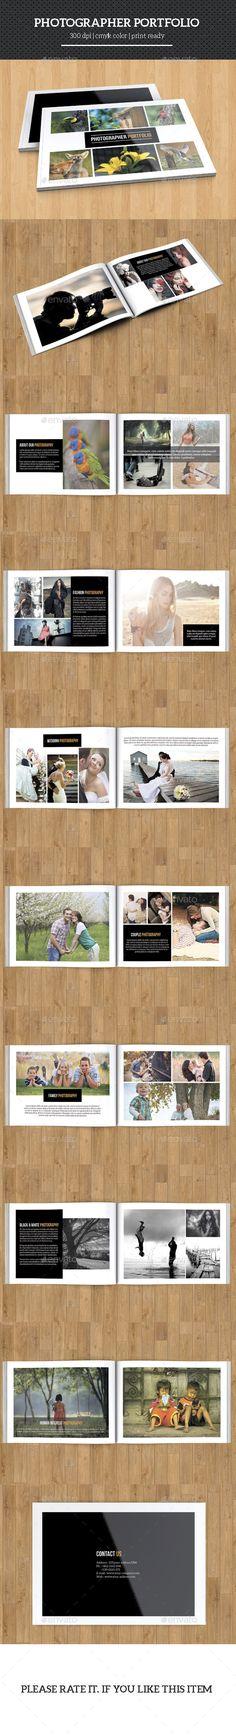 Photographer Portfolio Brochure Template #design Download: http://graphicriver.net/item/photographer-portfolio/11783249?ref=ksioks